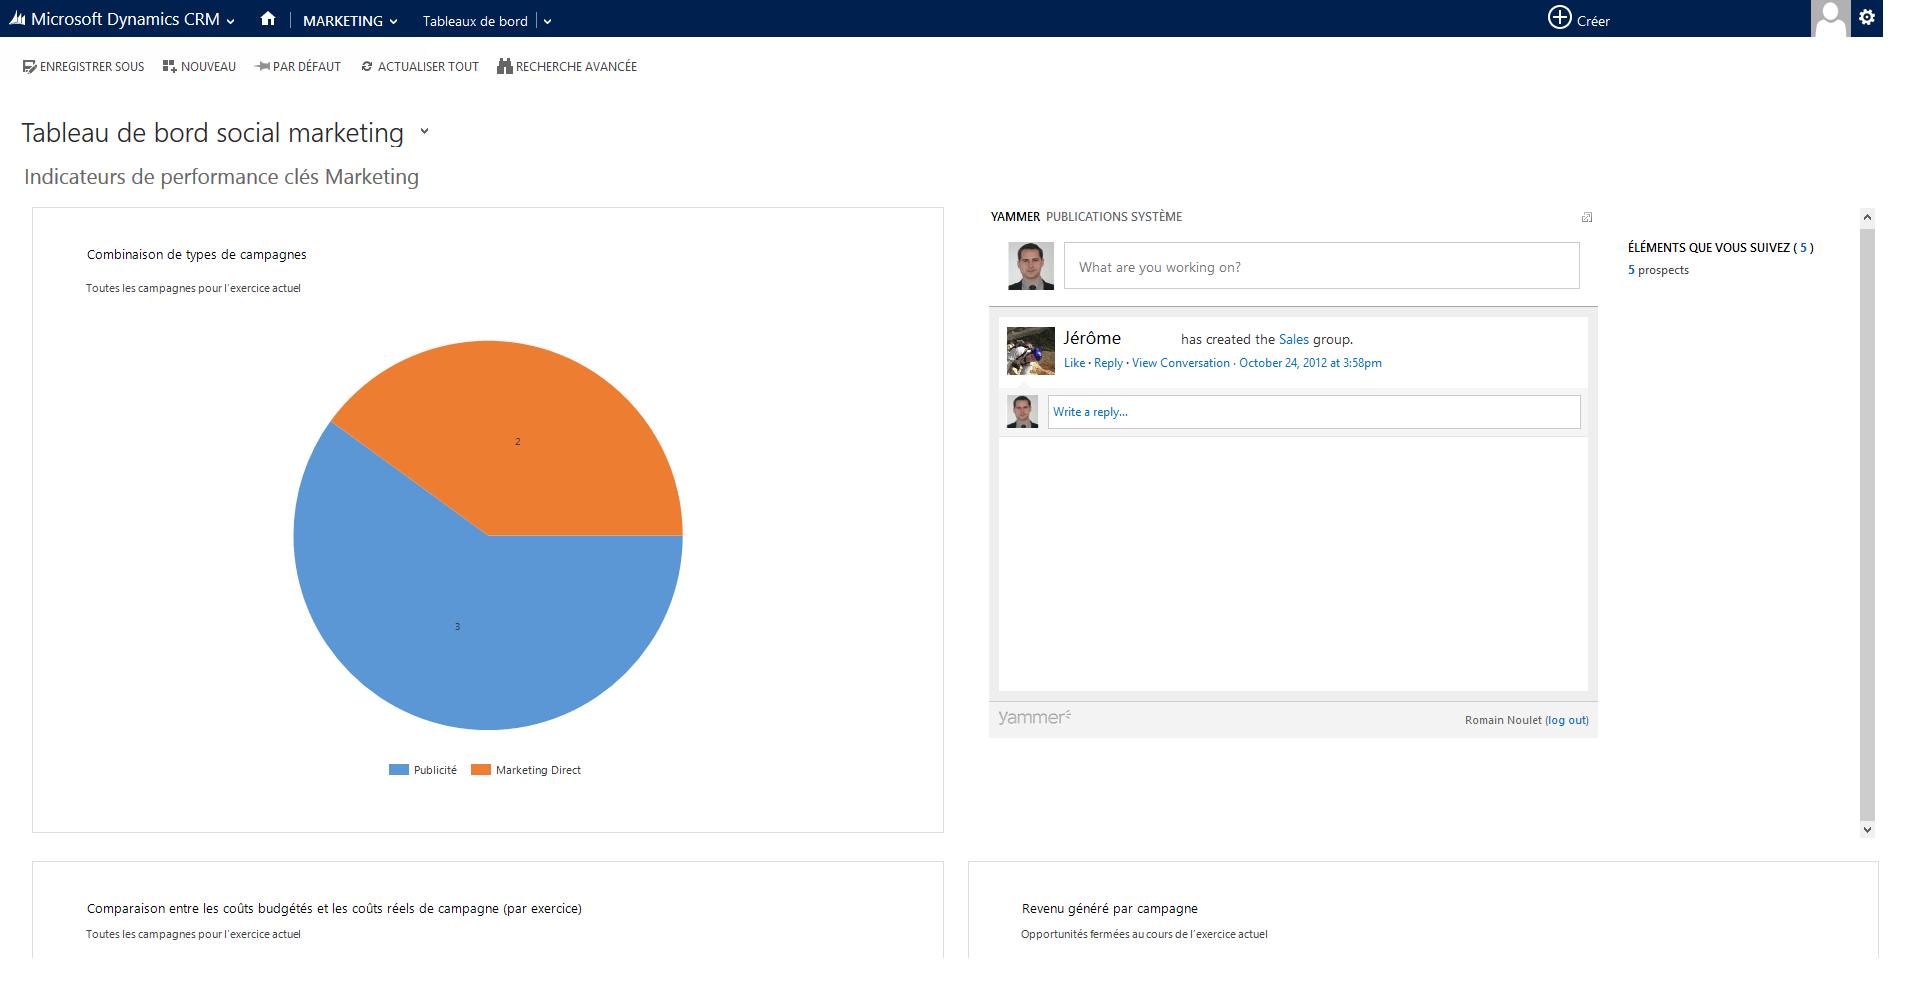 Microsoft Dynamics CRM: Tipo de contato, seguro contra perda de dados, Etiquetas